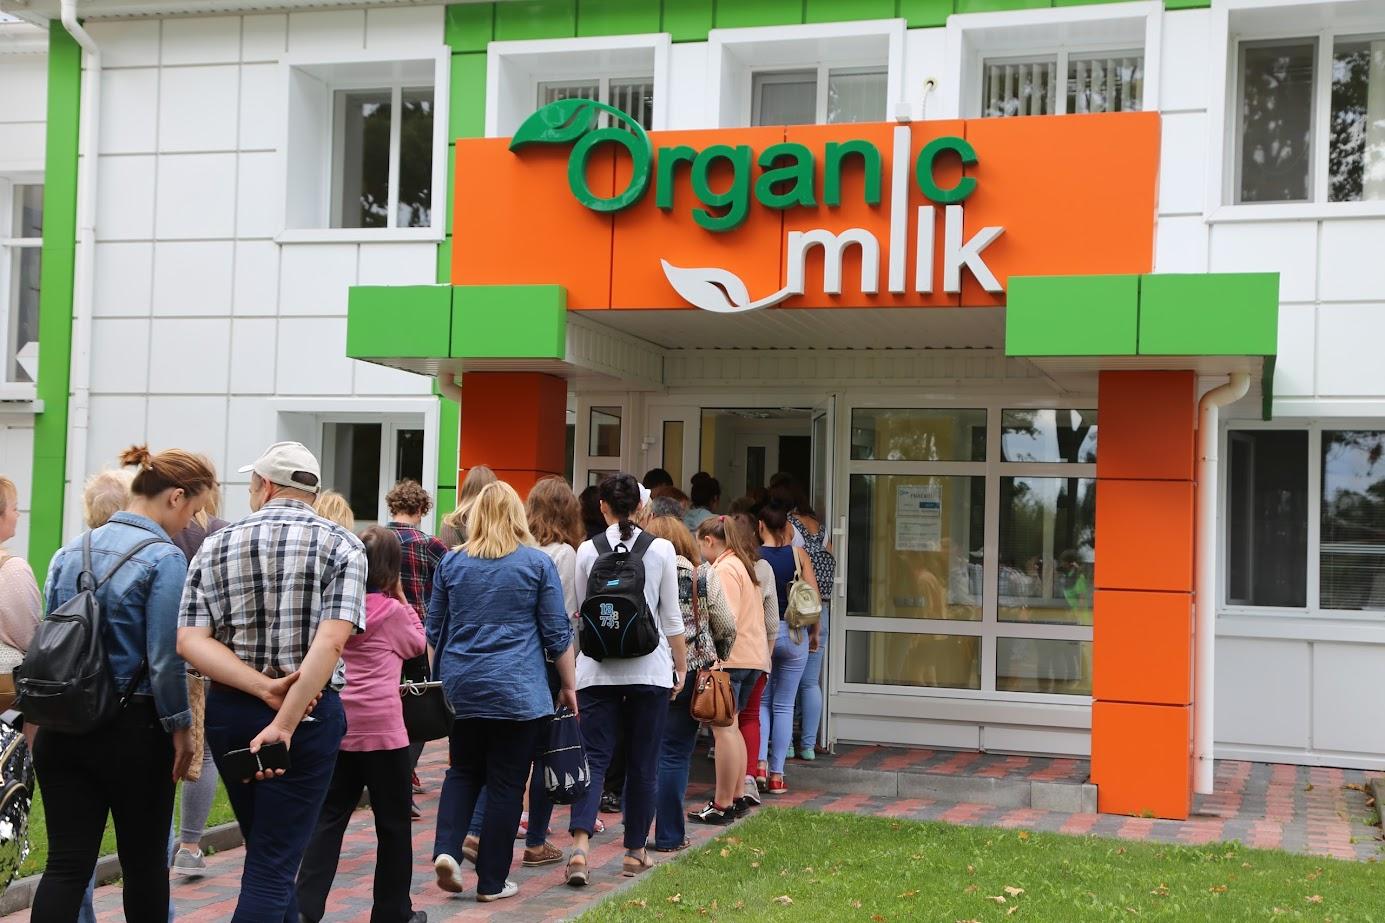 органик милк organic milk